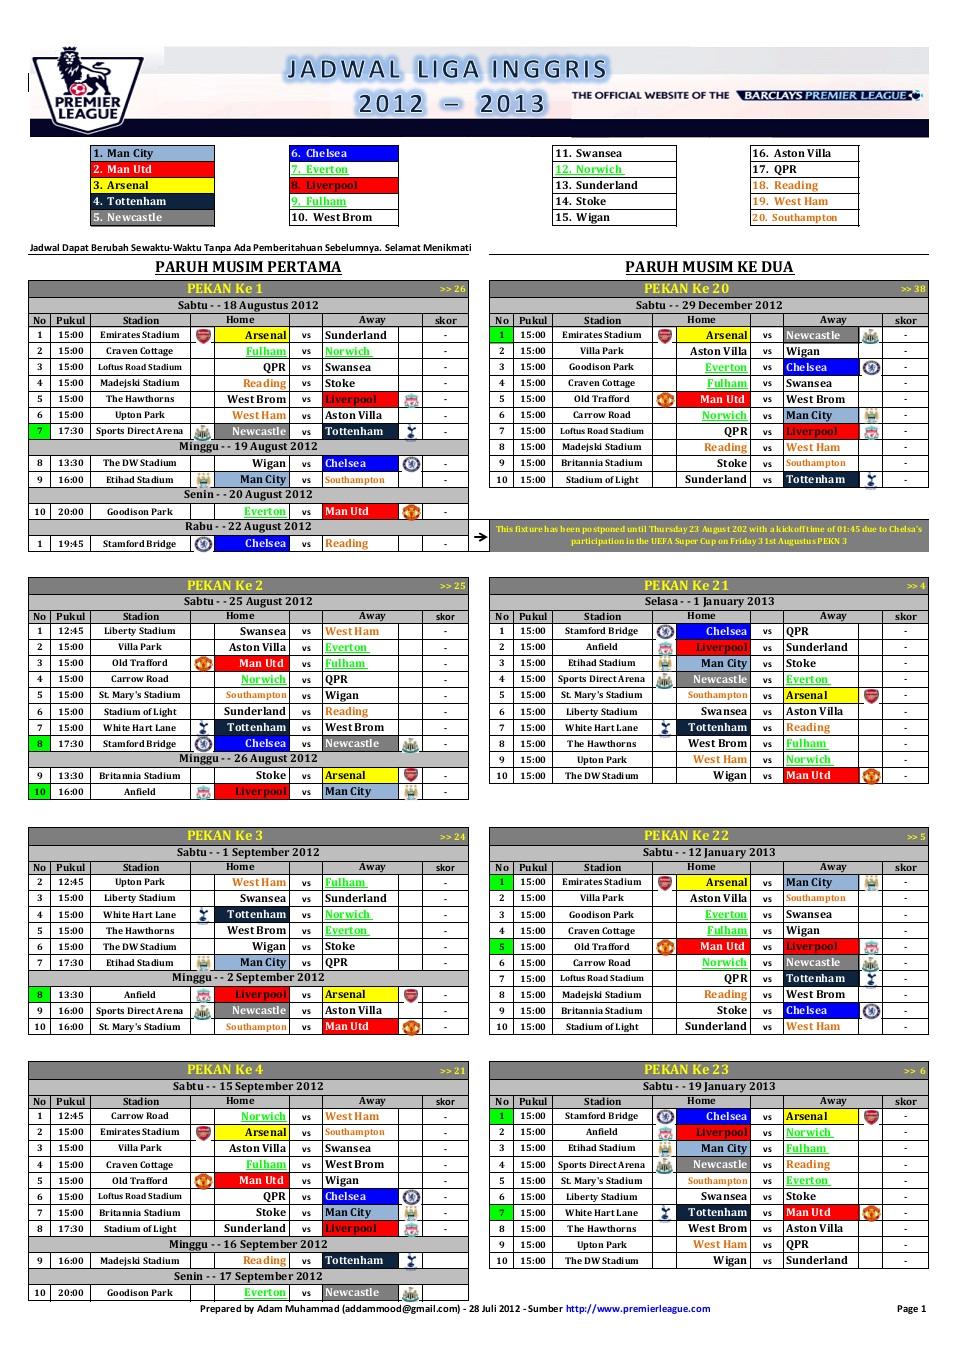 Jadwal Liga Premier Inggris 2012 2013 Lengkap   Hal 1 Jpg